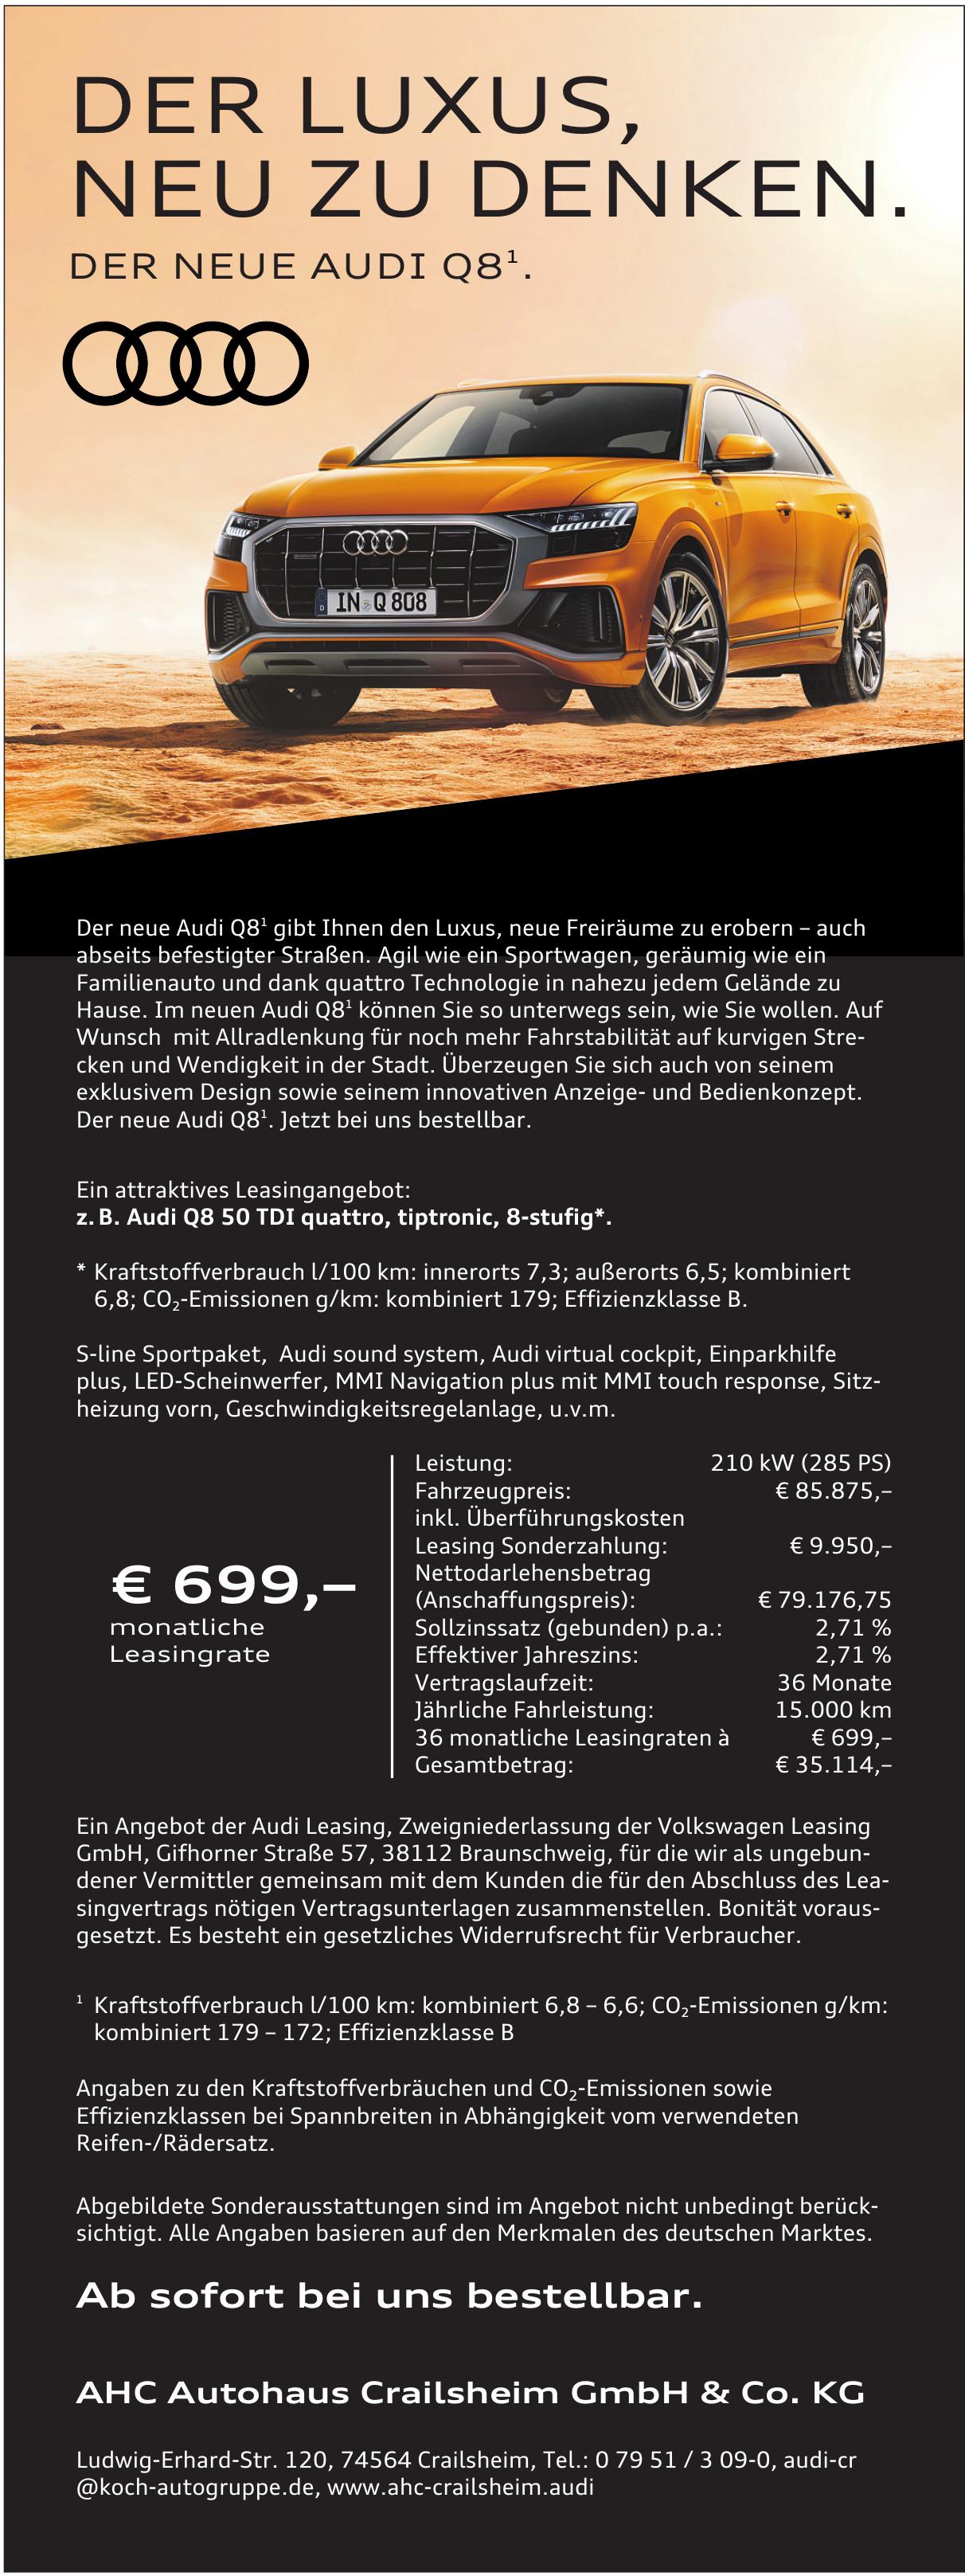 Neuer Audi Q8 Beim Ahc Autohaus Crailsheim